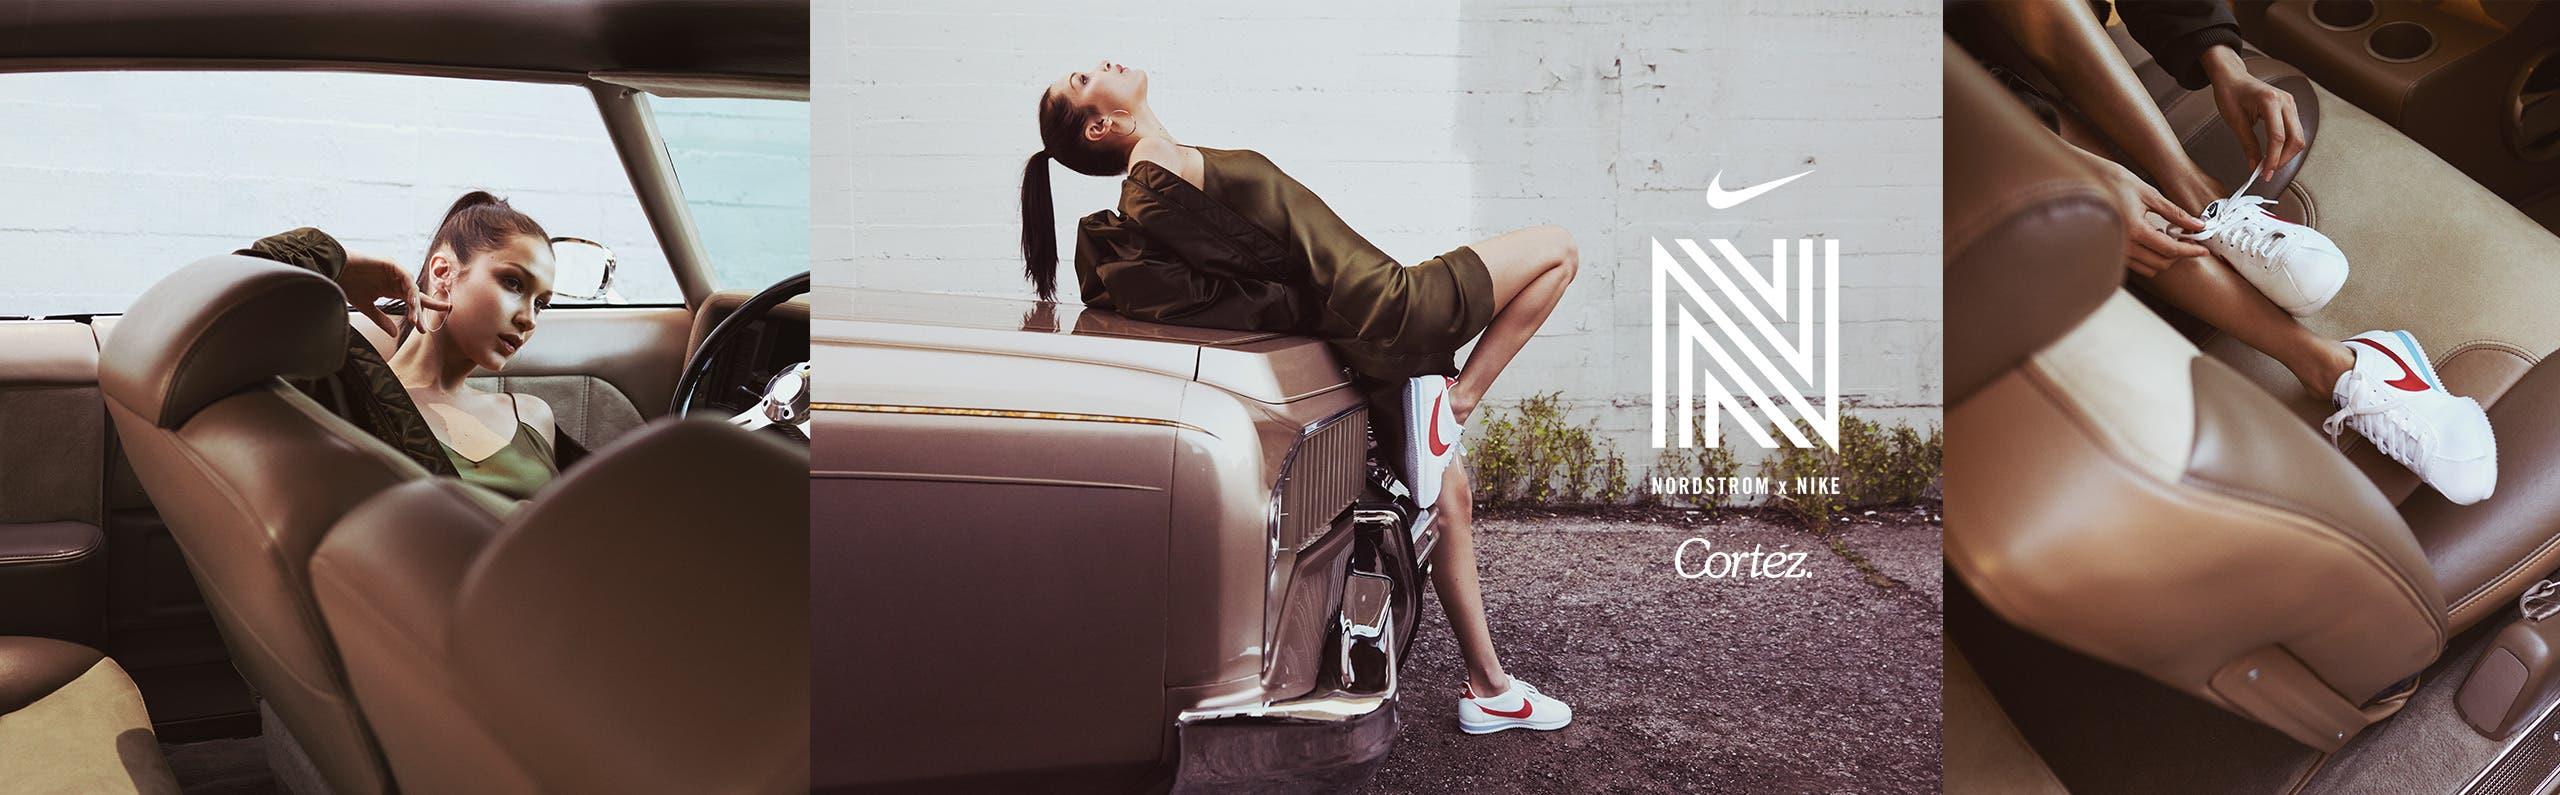 Nordstrom x Nike Cortez.